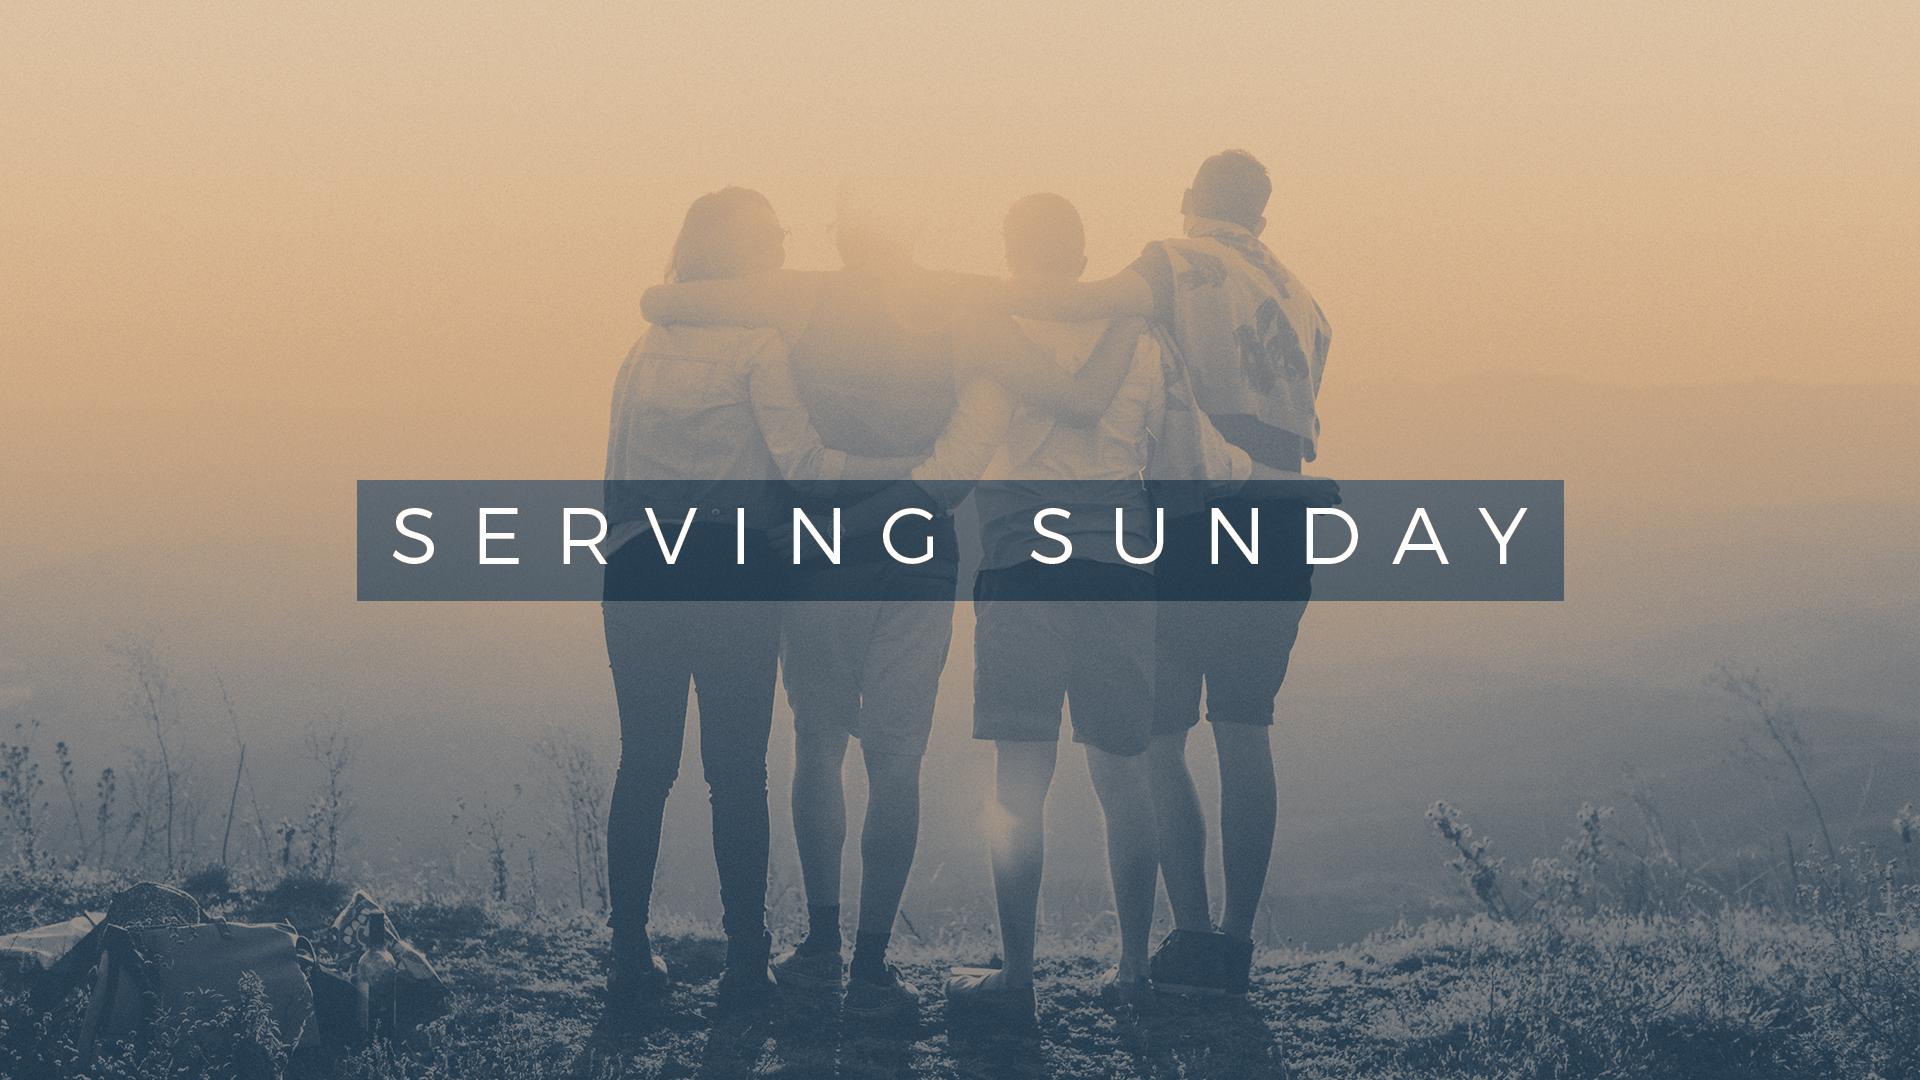 Serving sunday